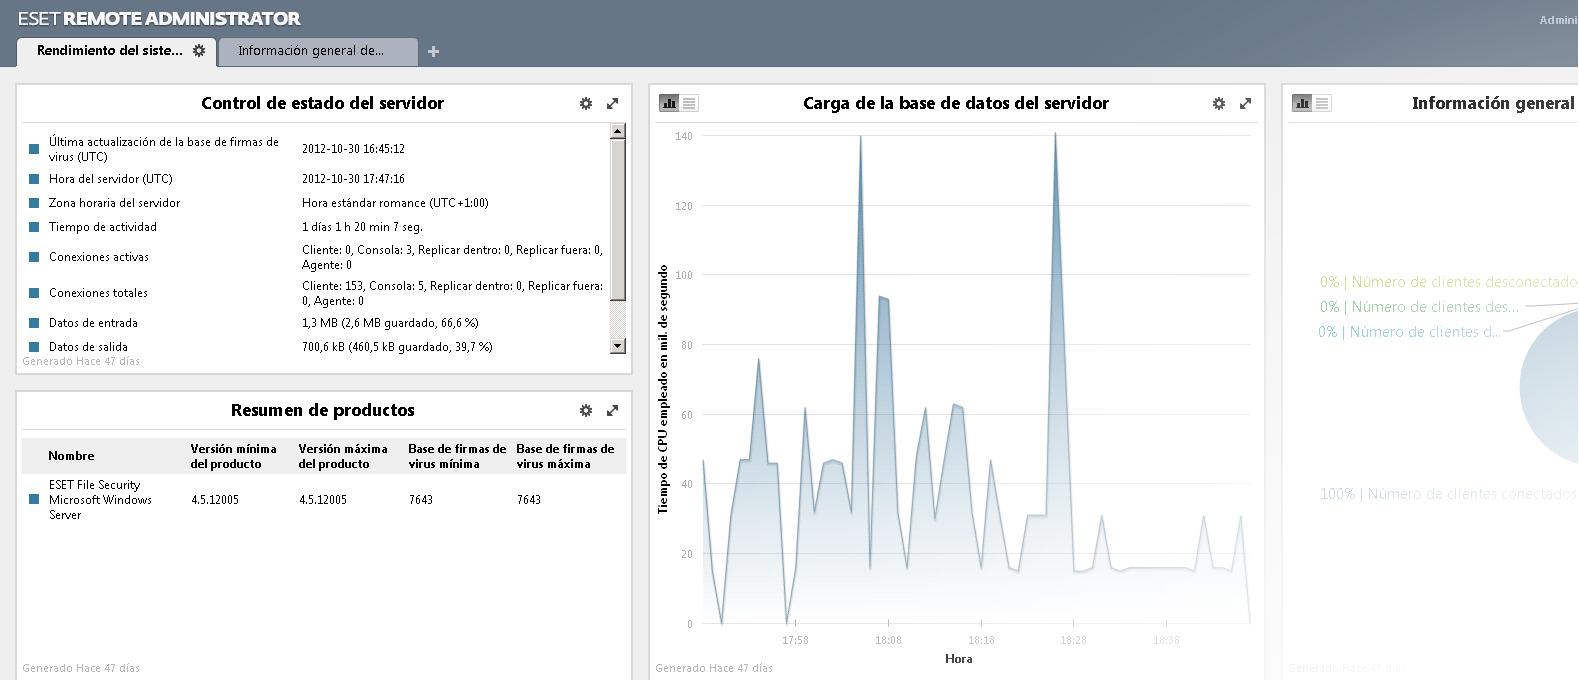 ESET Remote Administrator Dashboard screenshot